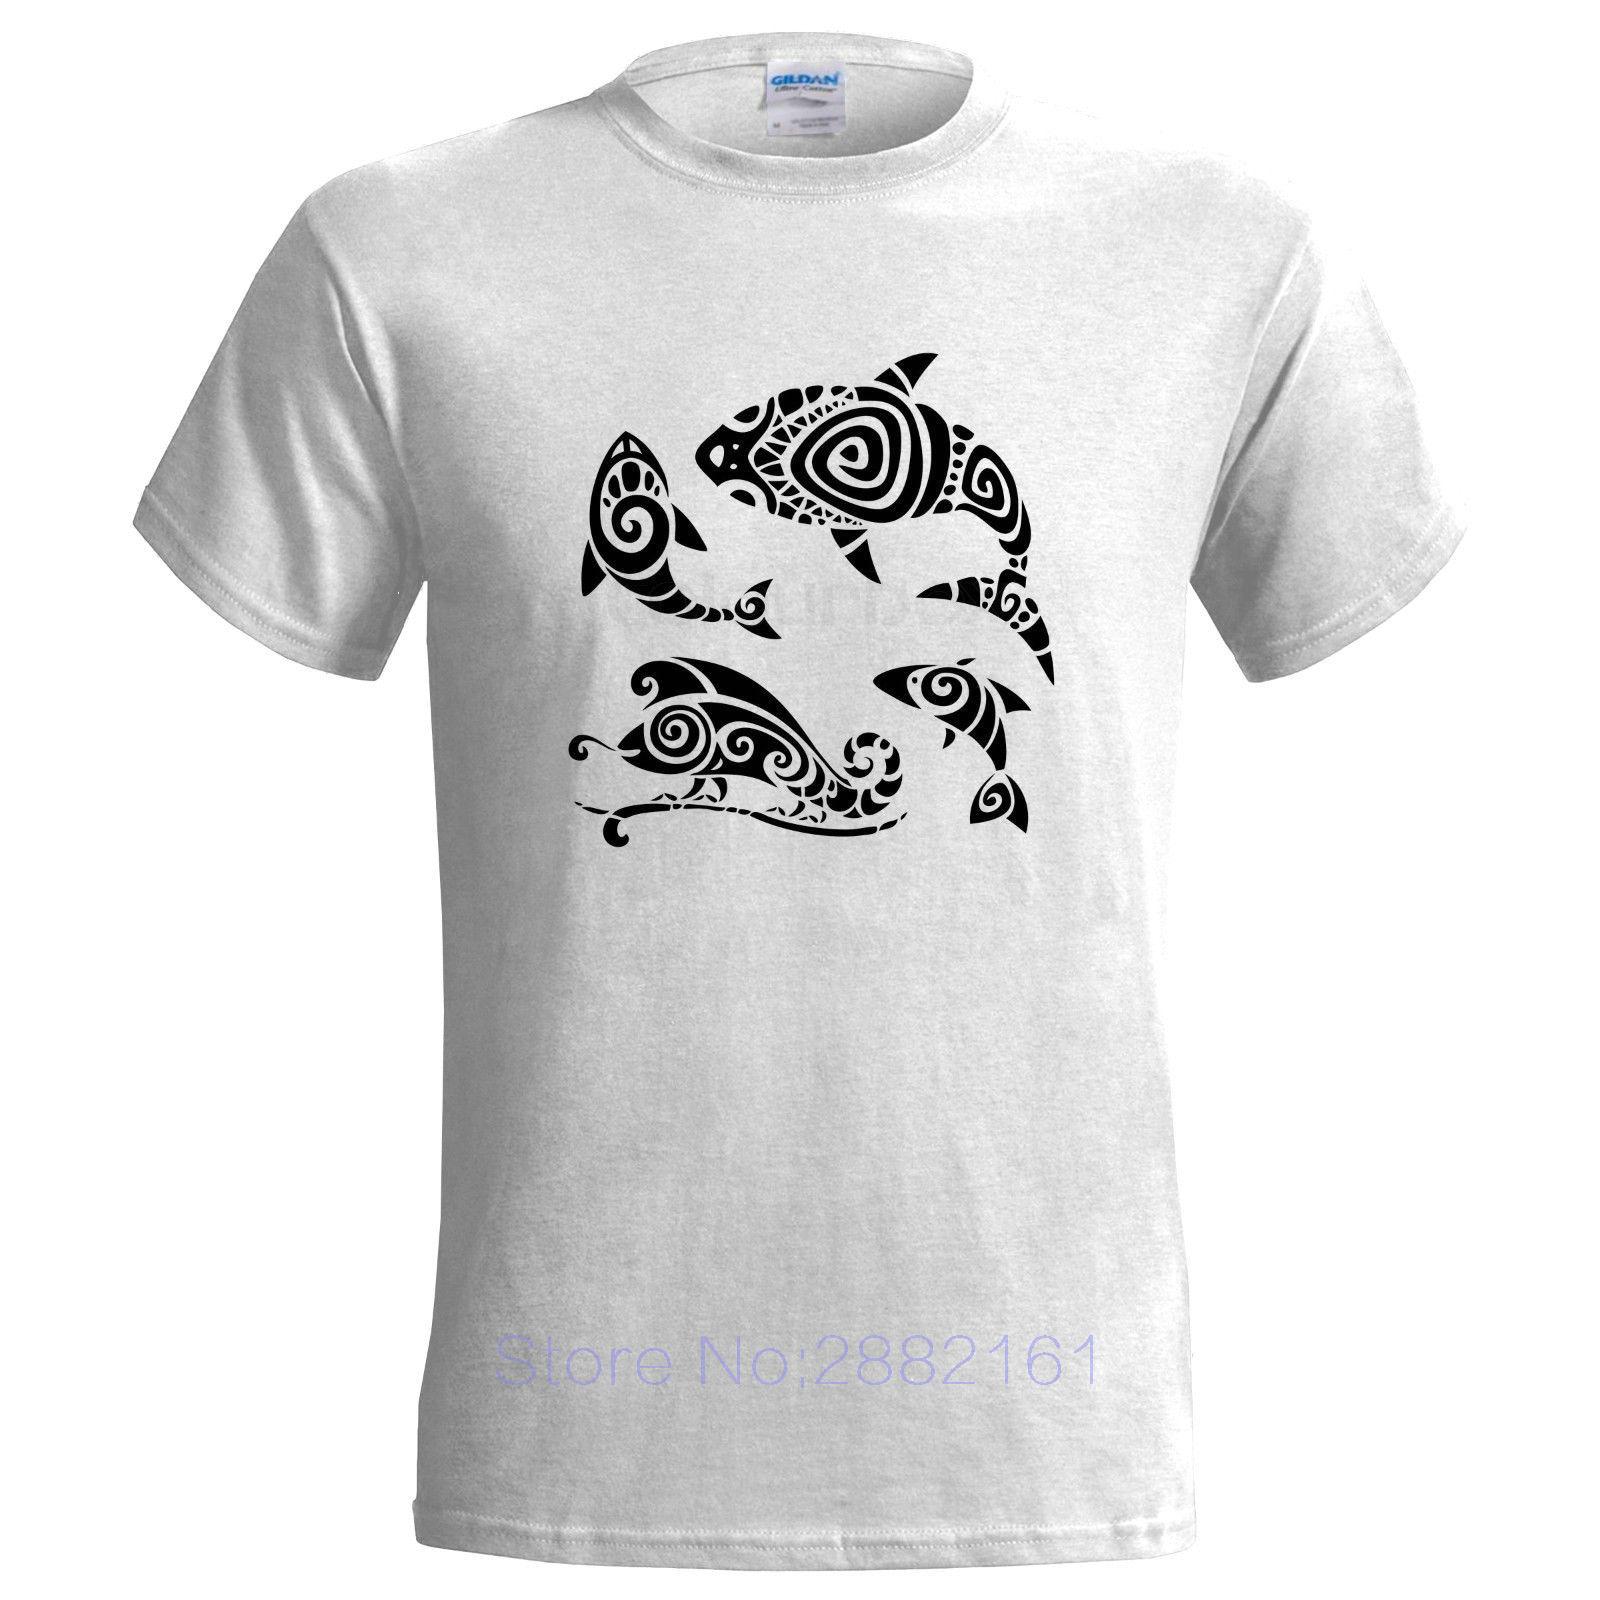 TRIBAL FISH DESIGN MENS T SHIRT MAORI PISCES TATTOO STYLE WATER HEALTH ART 100% Cotton T-Shirts for Man